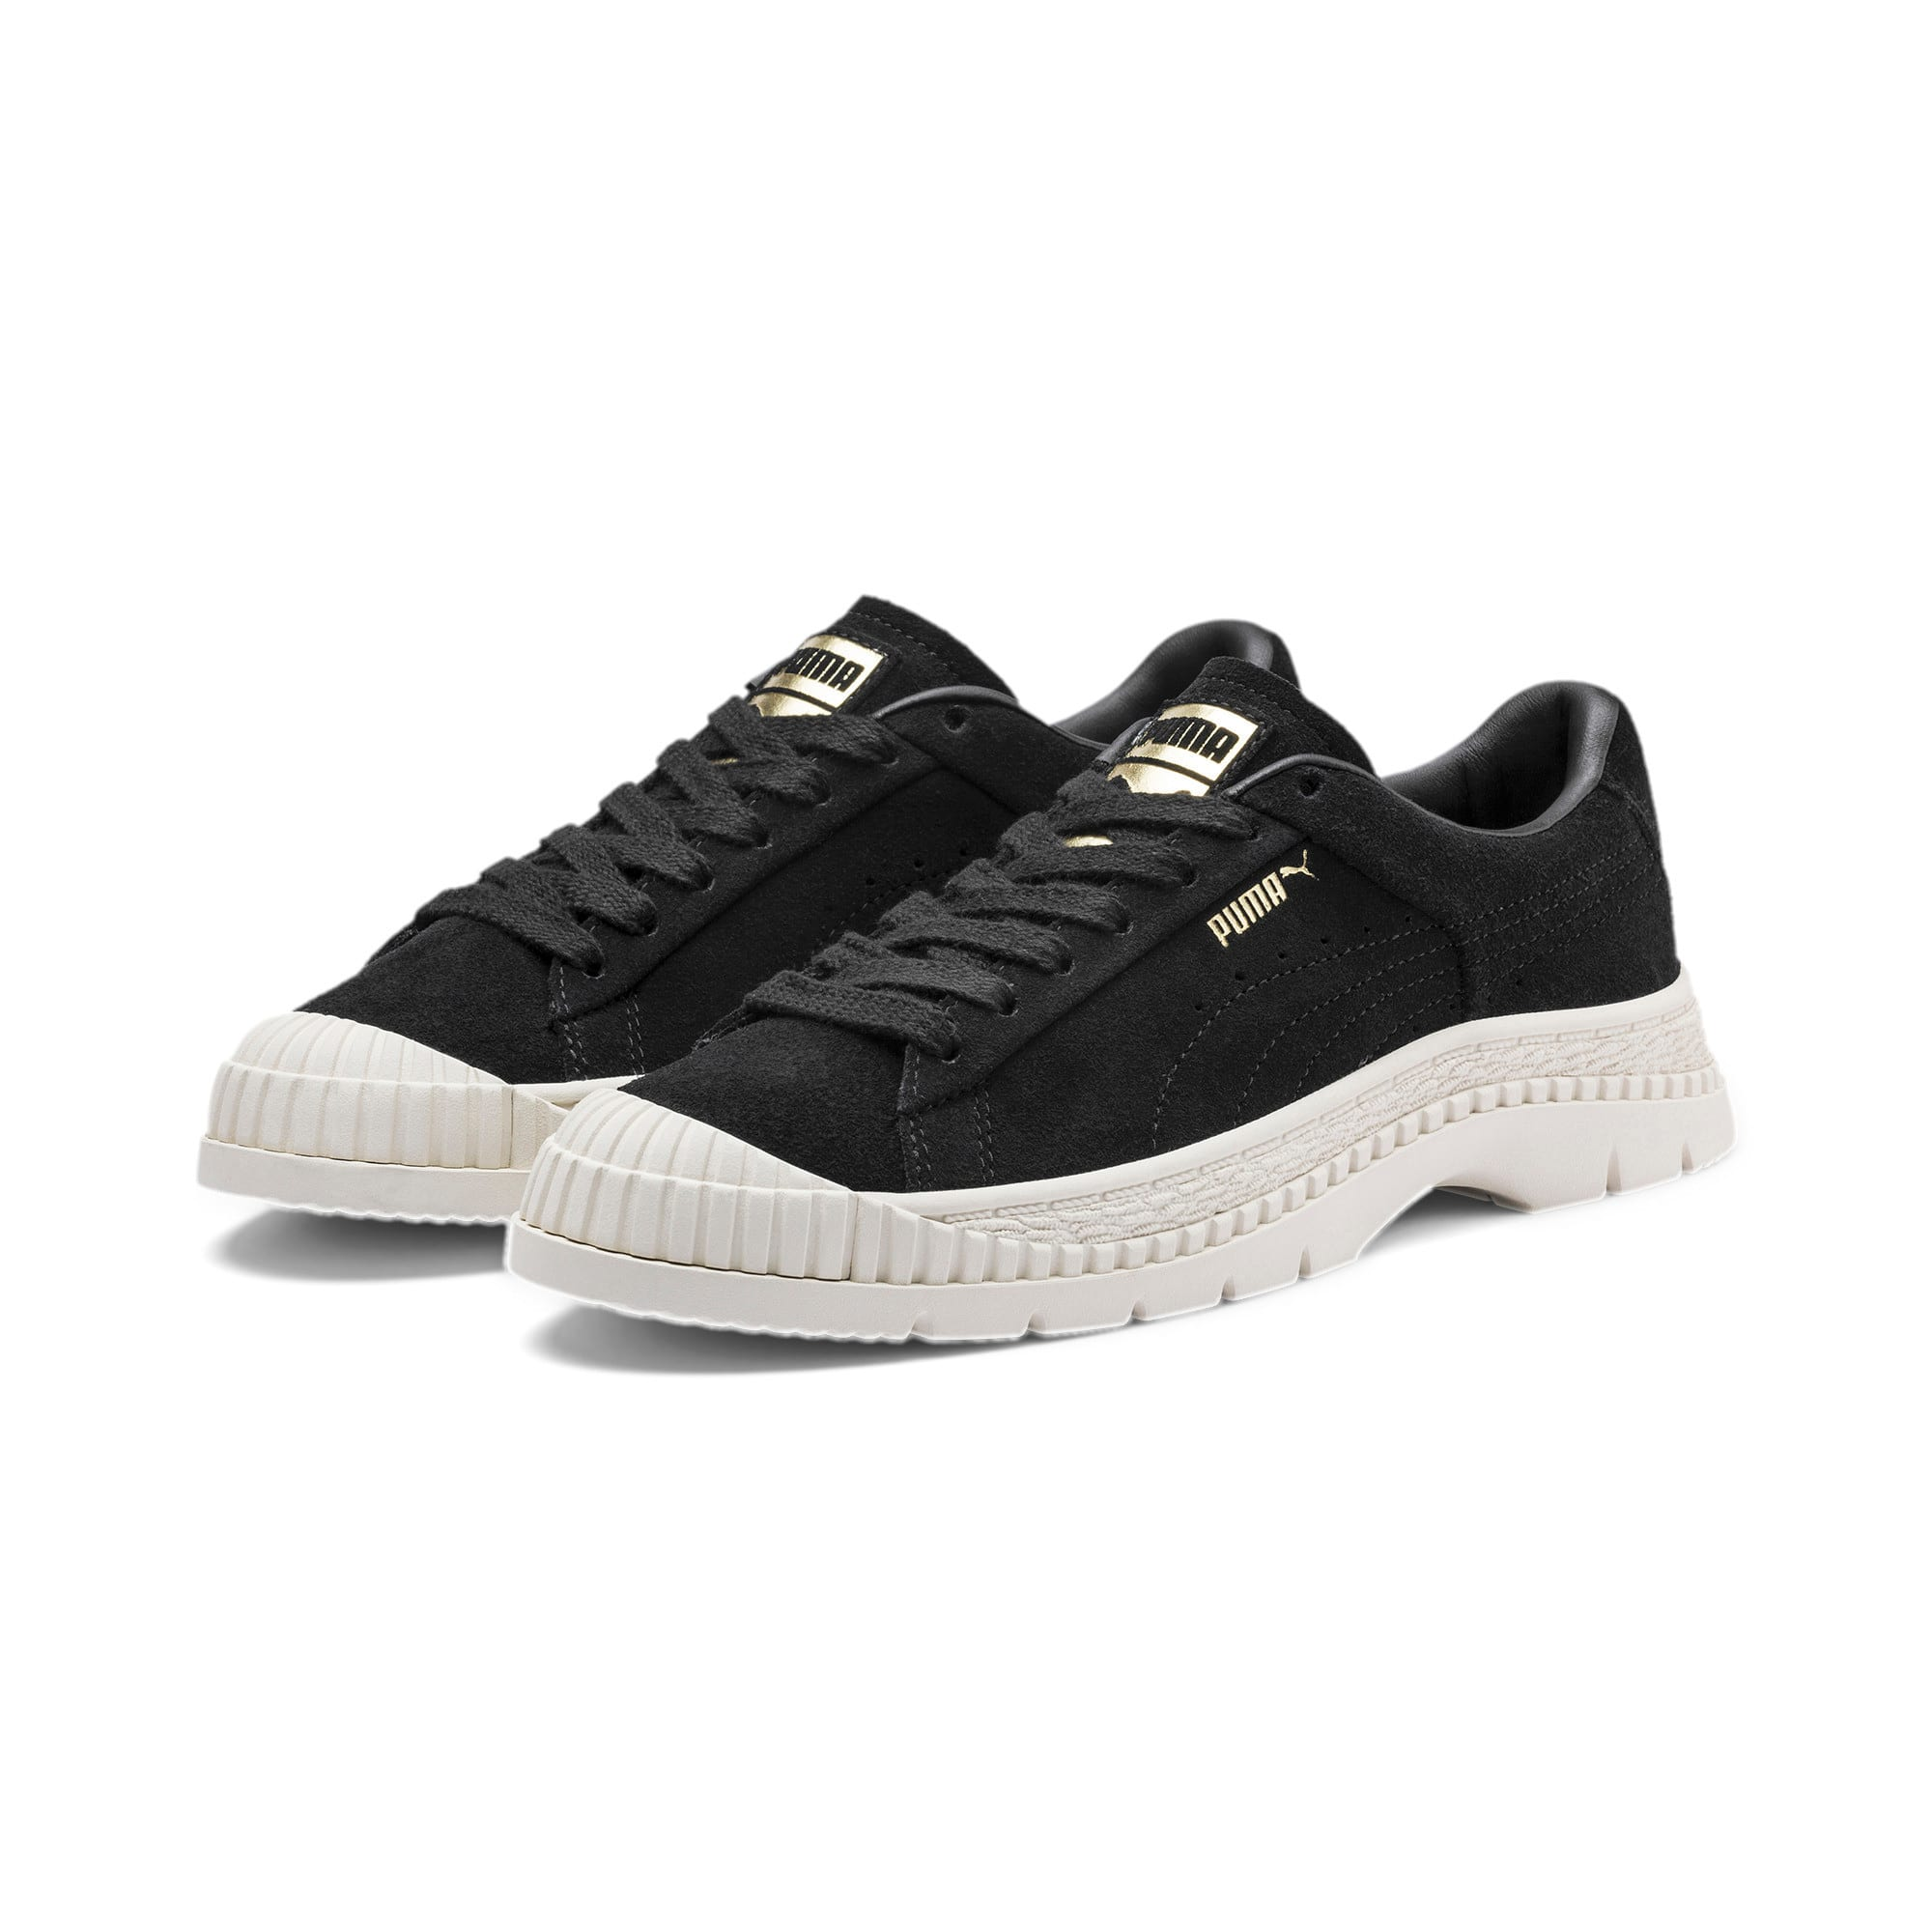 Thumbnail 2 of Utility Suede Women's Sneakers, Puma Black, medium